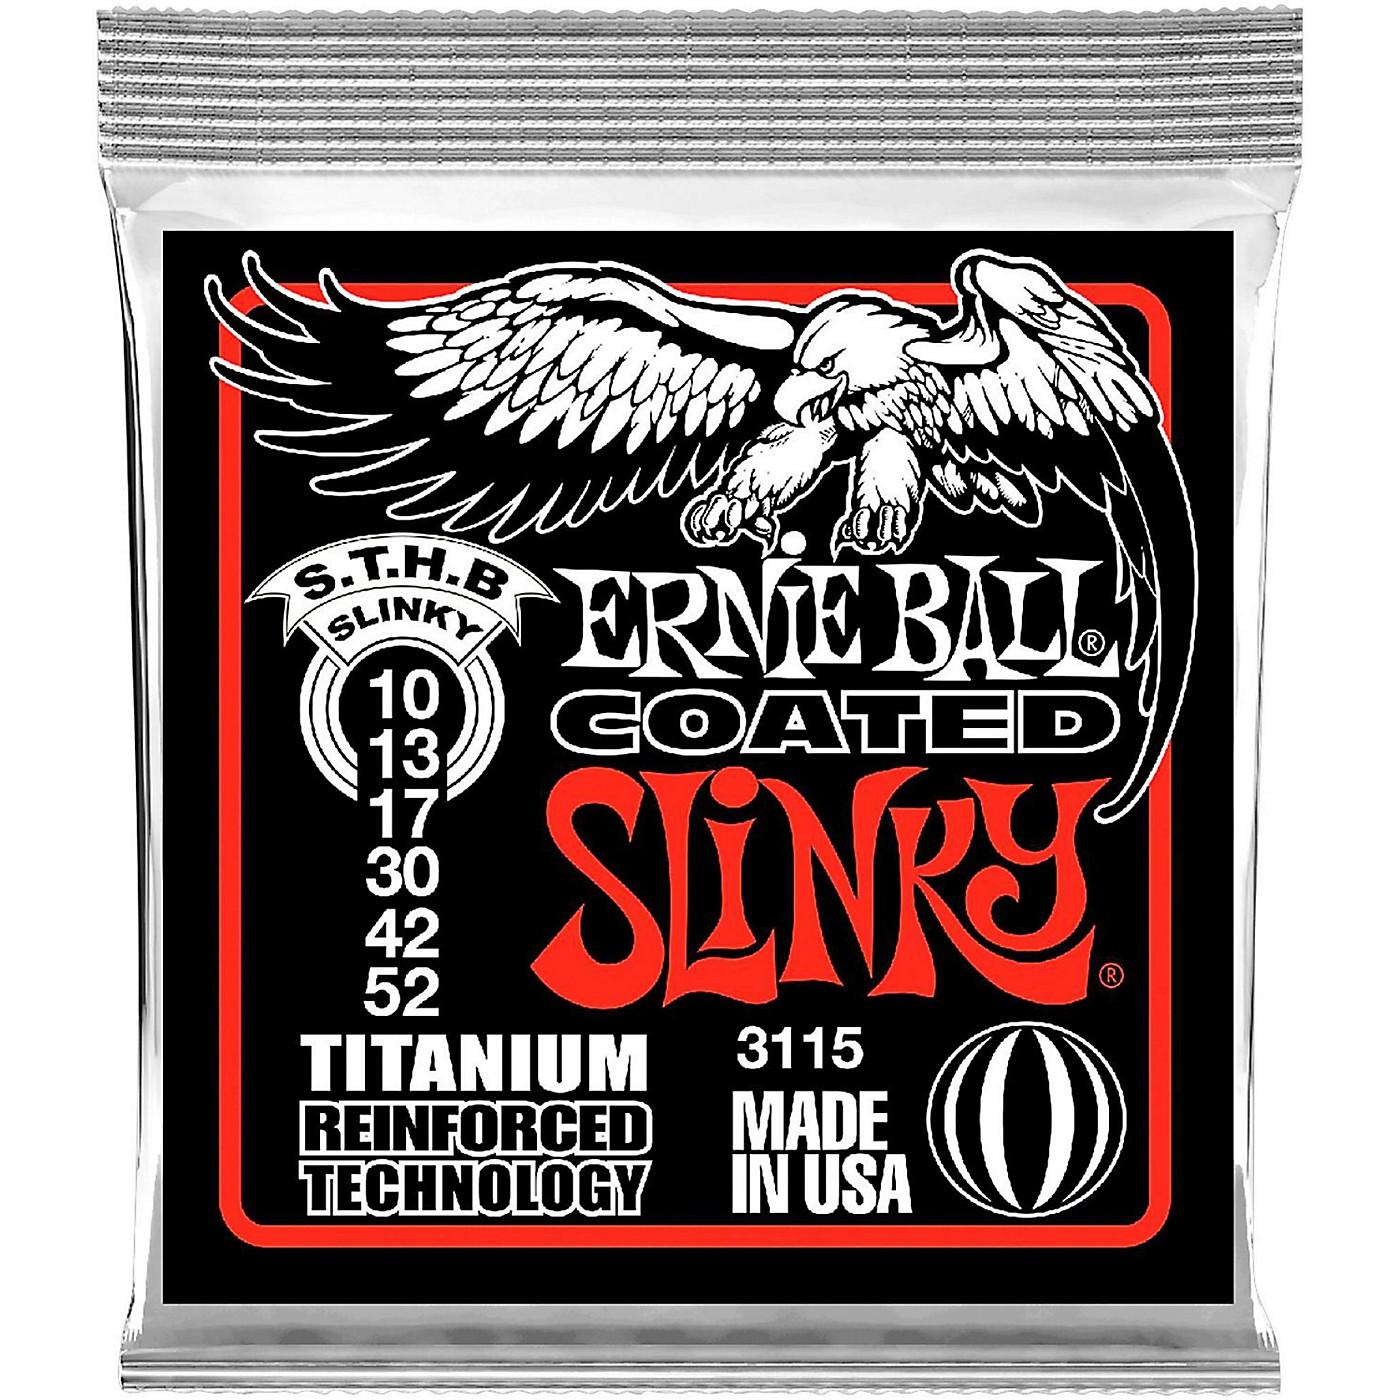 Ernie Ball 3115 Coated Electric STHB Slinky Guitar Strings thumbnail